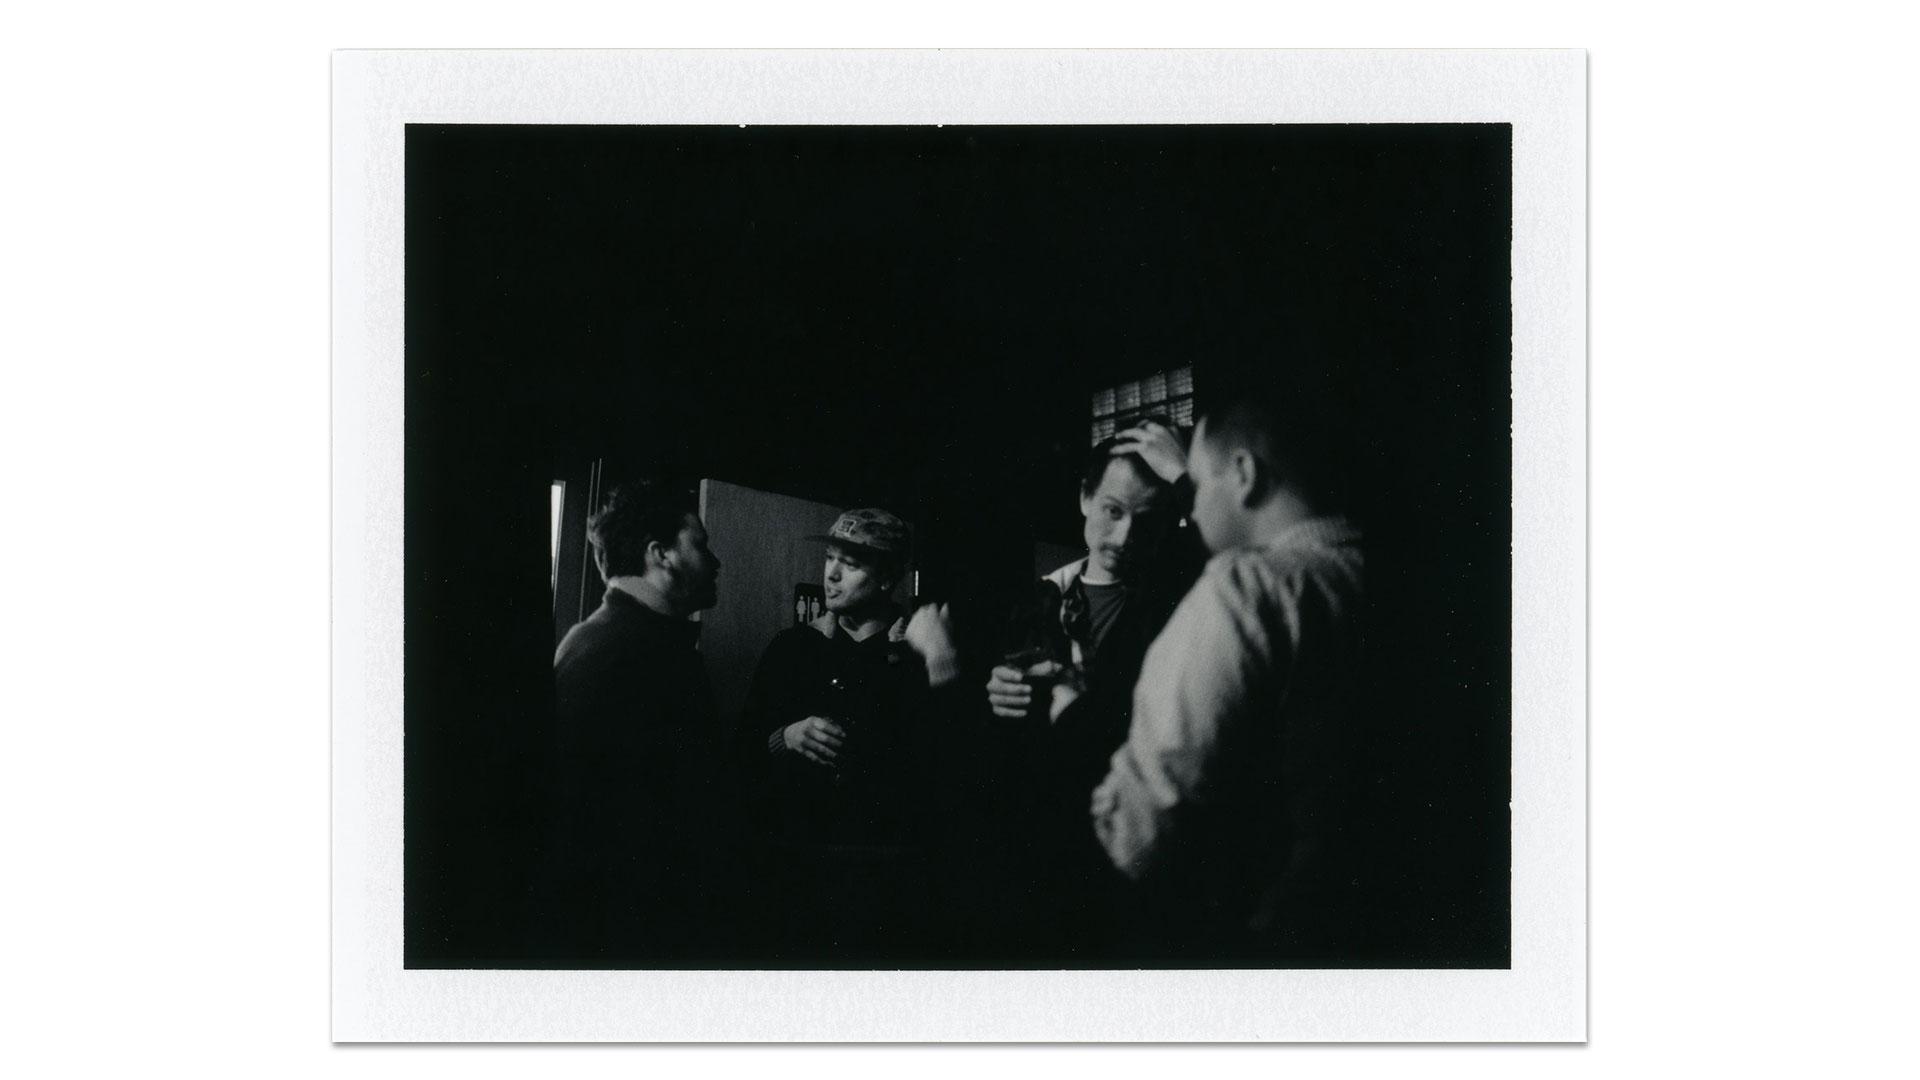 Thinktomake-Portrait-Beer-Film-Photography.jpg